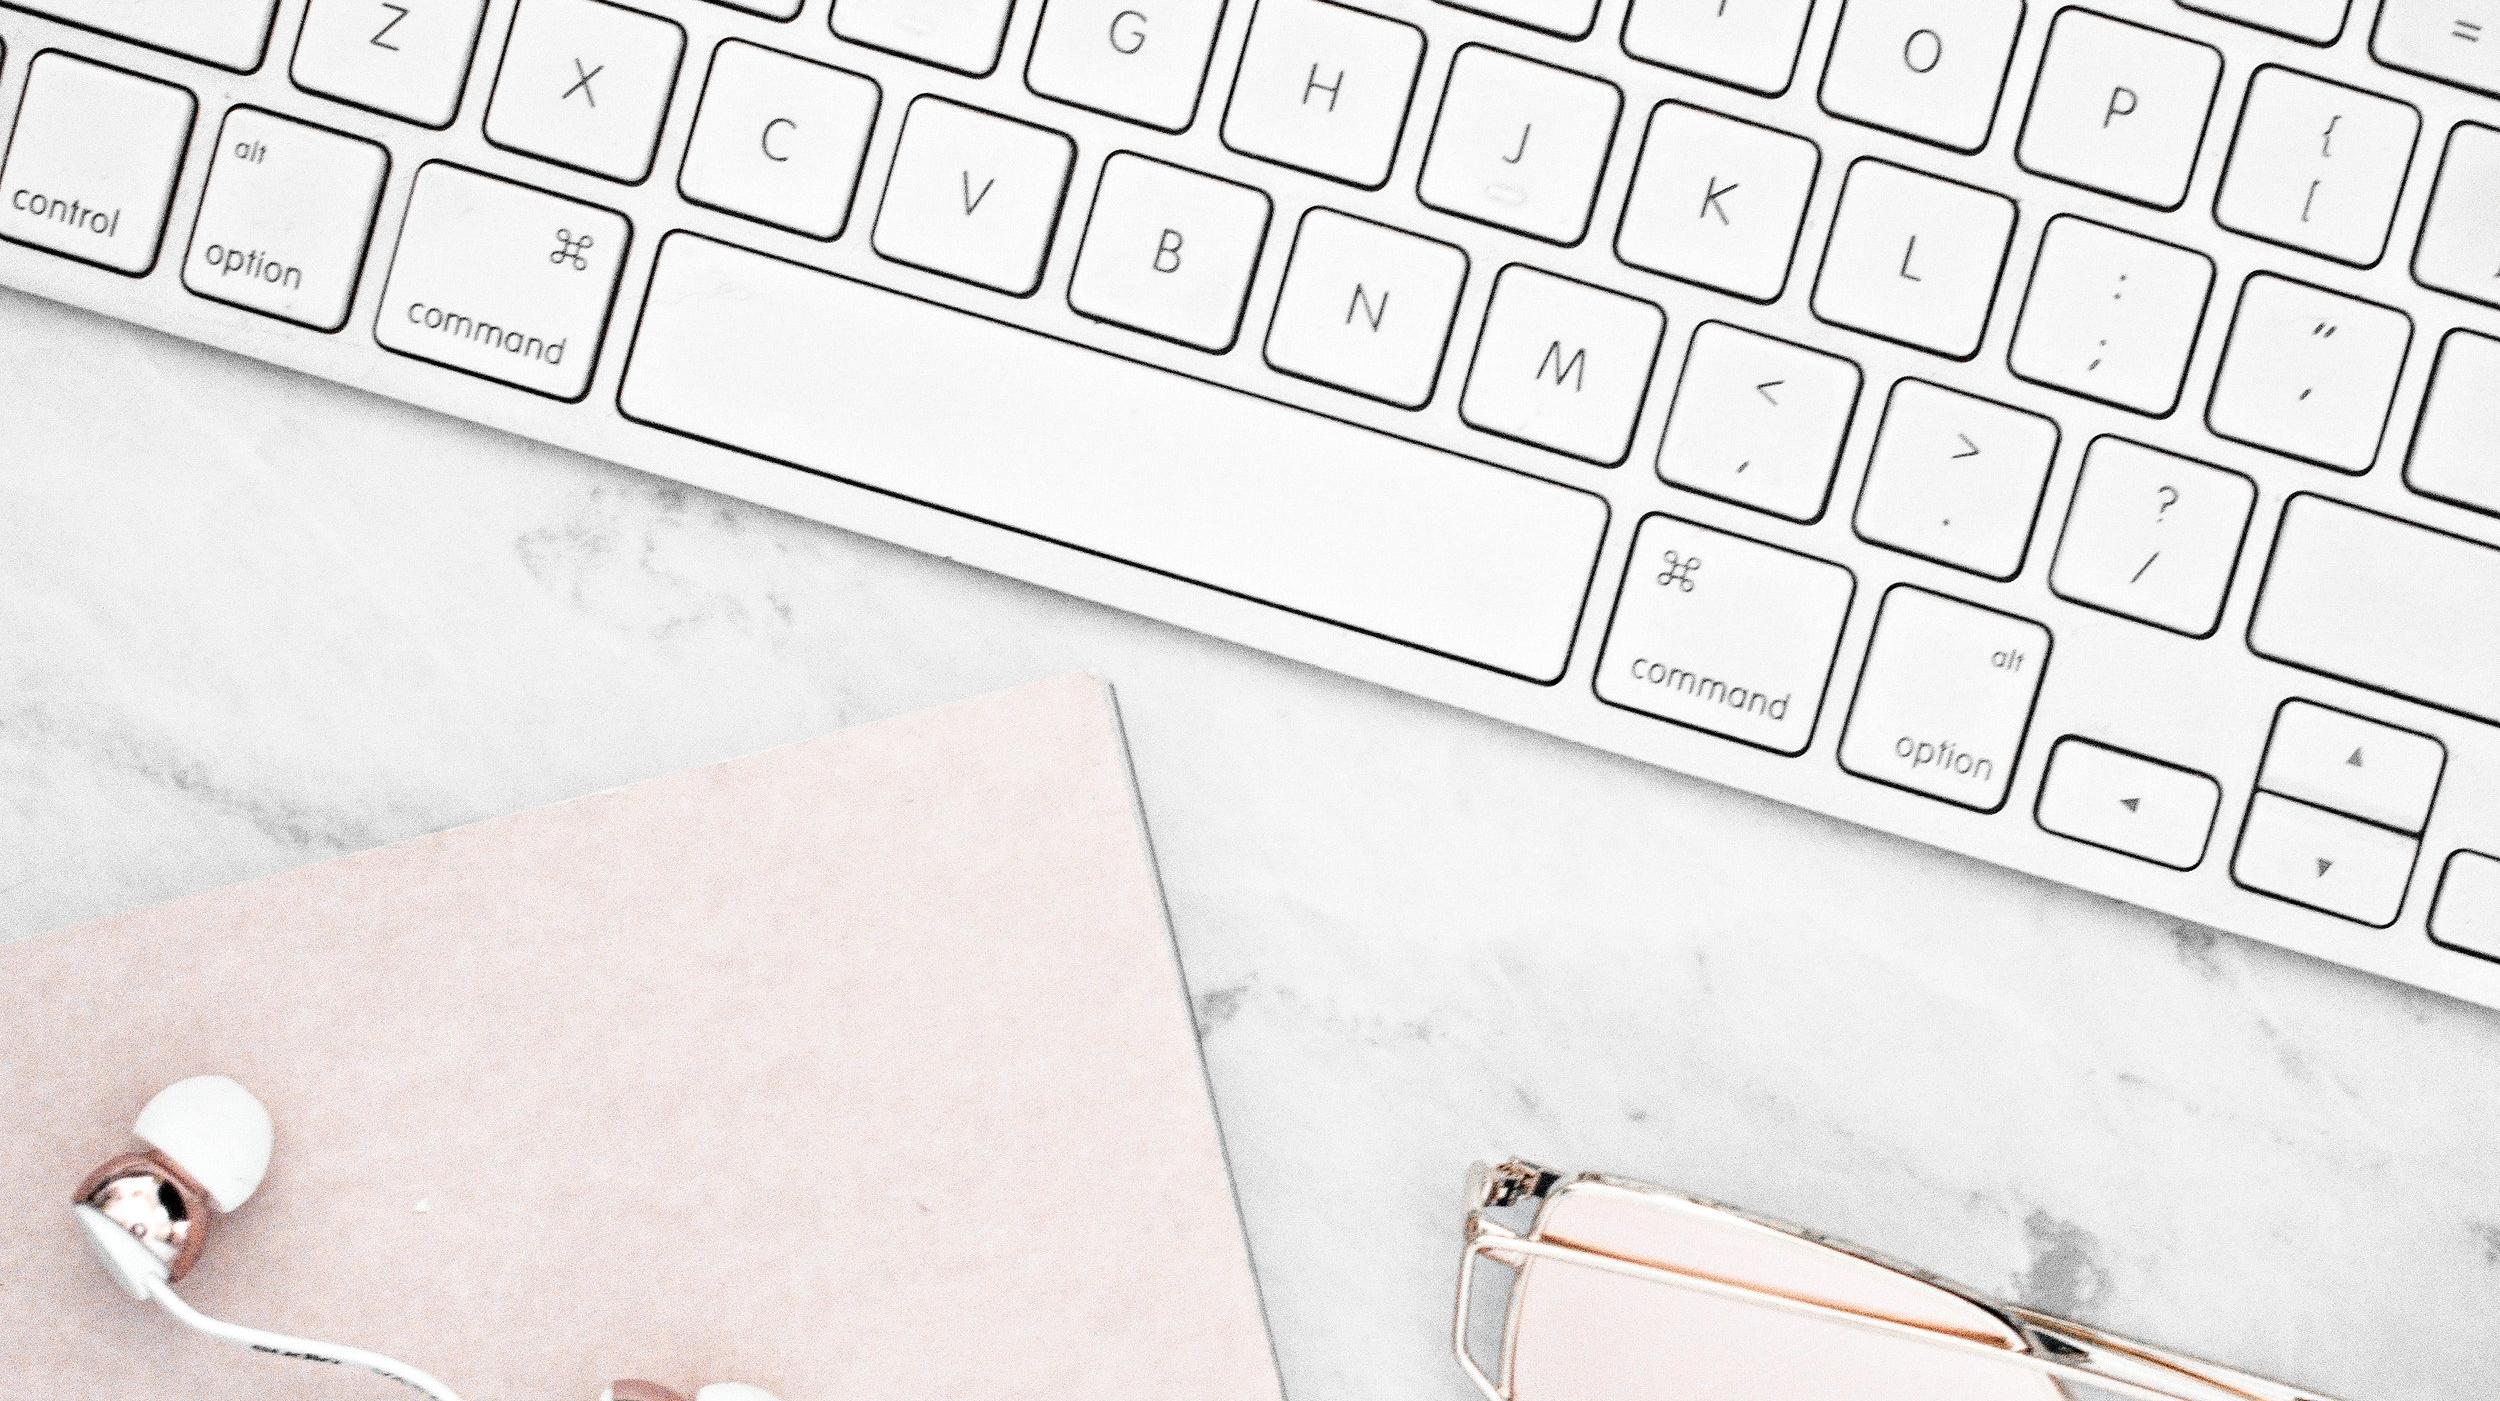 122 blog post ideas